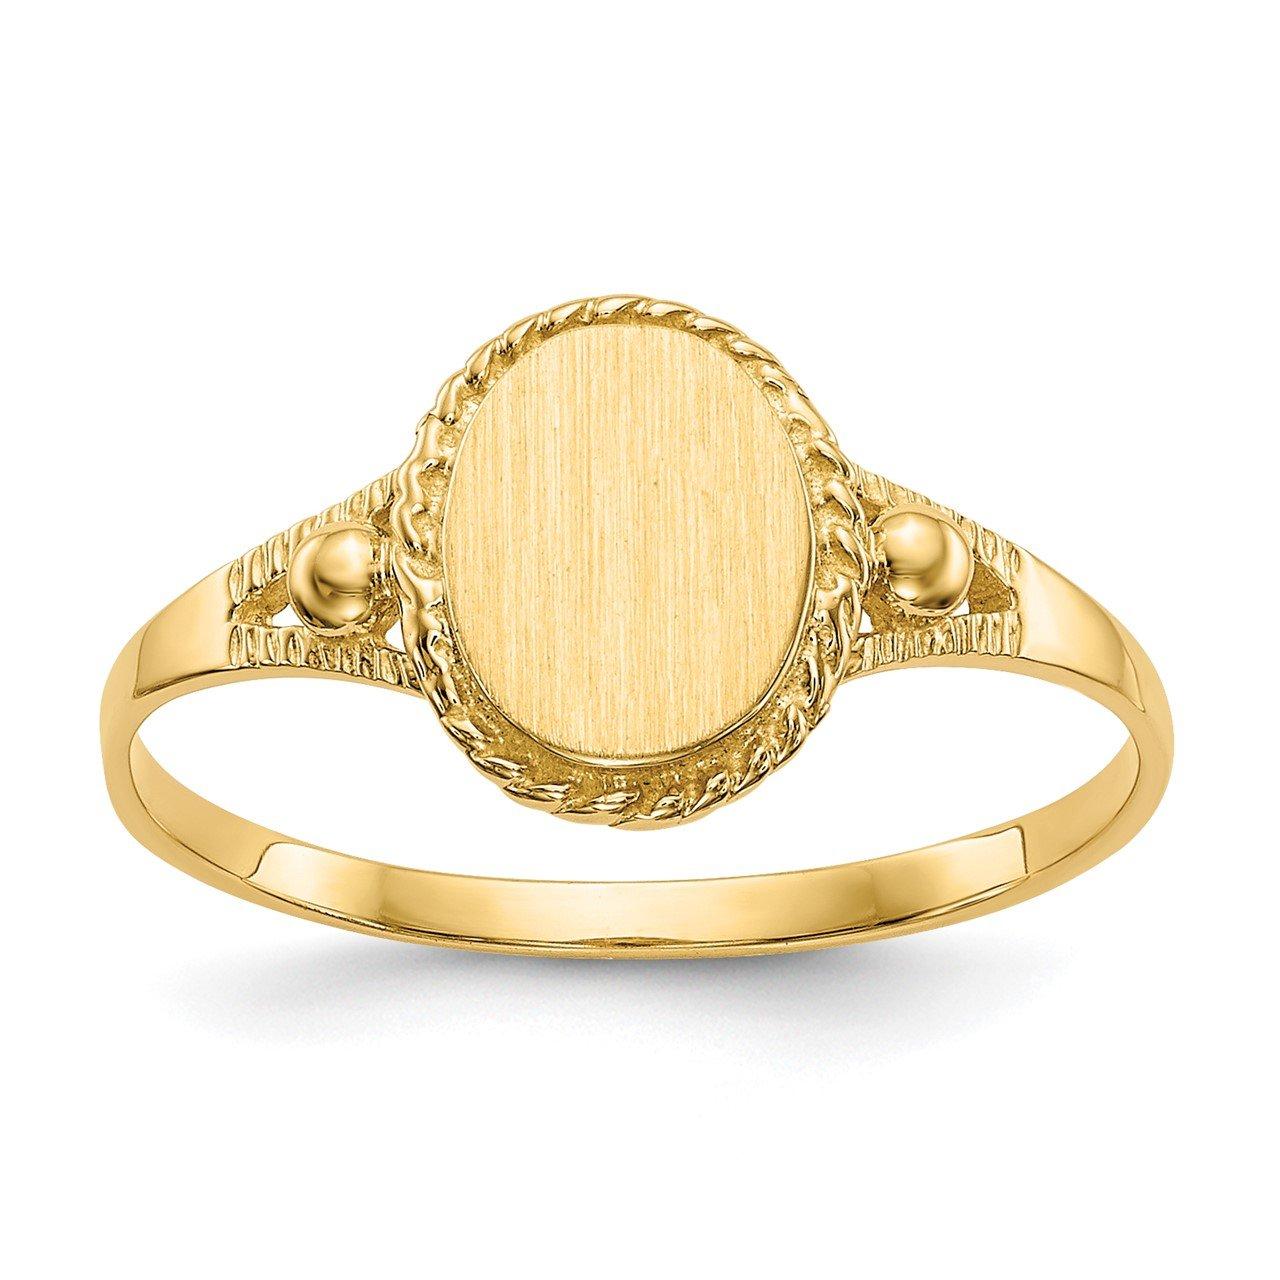 14k Childs Fancy Signet Ring